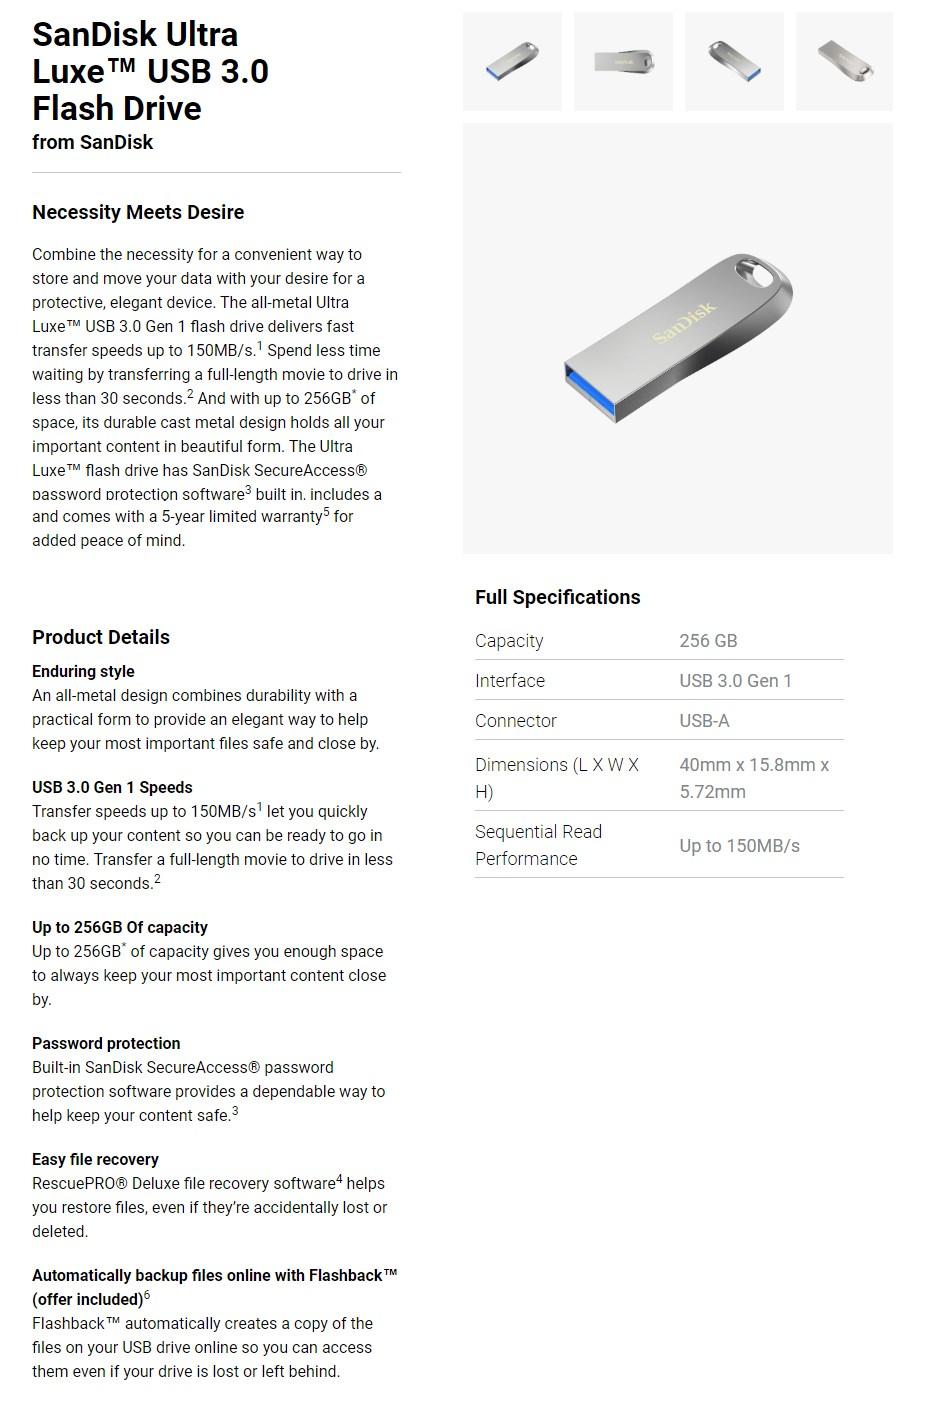 sandisk-256gb-ultra-luxe-usb-30-flash-drive-ac29339-2.jpg